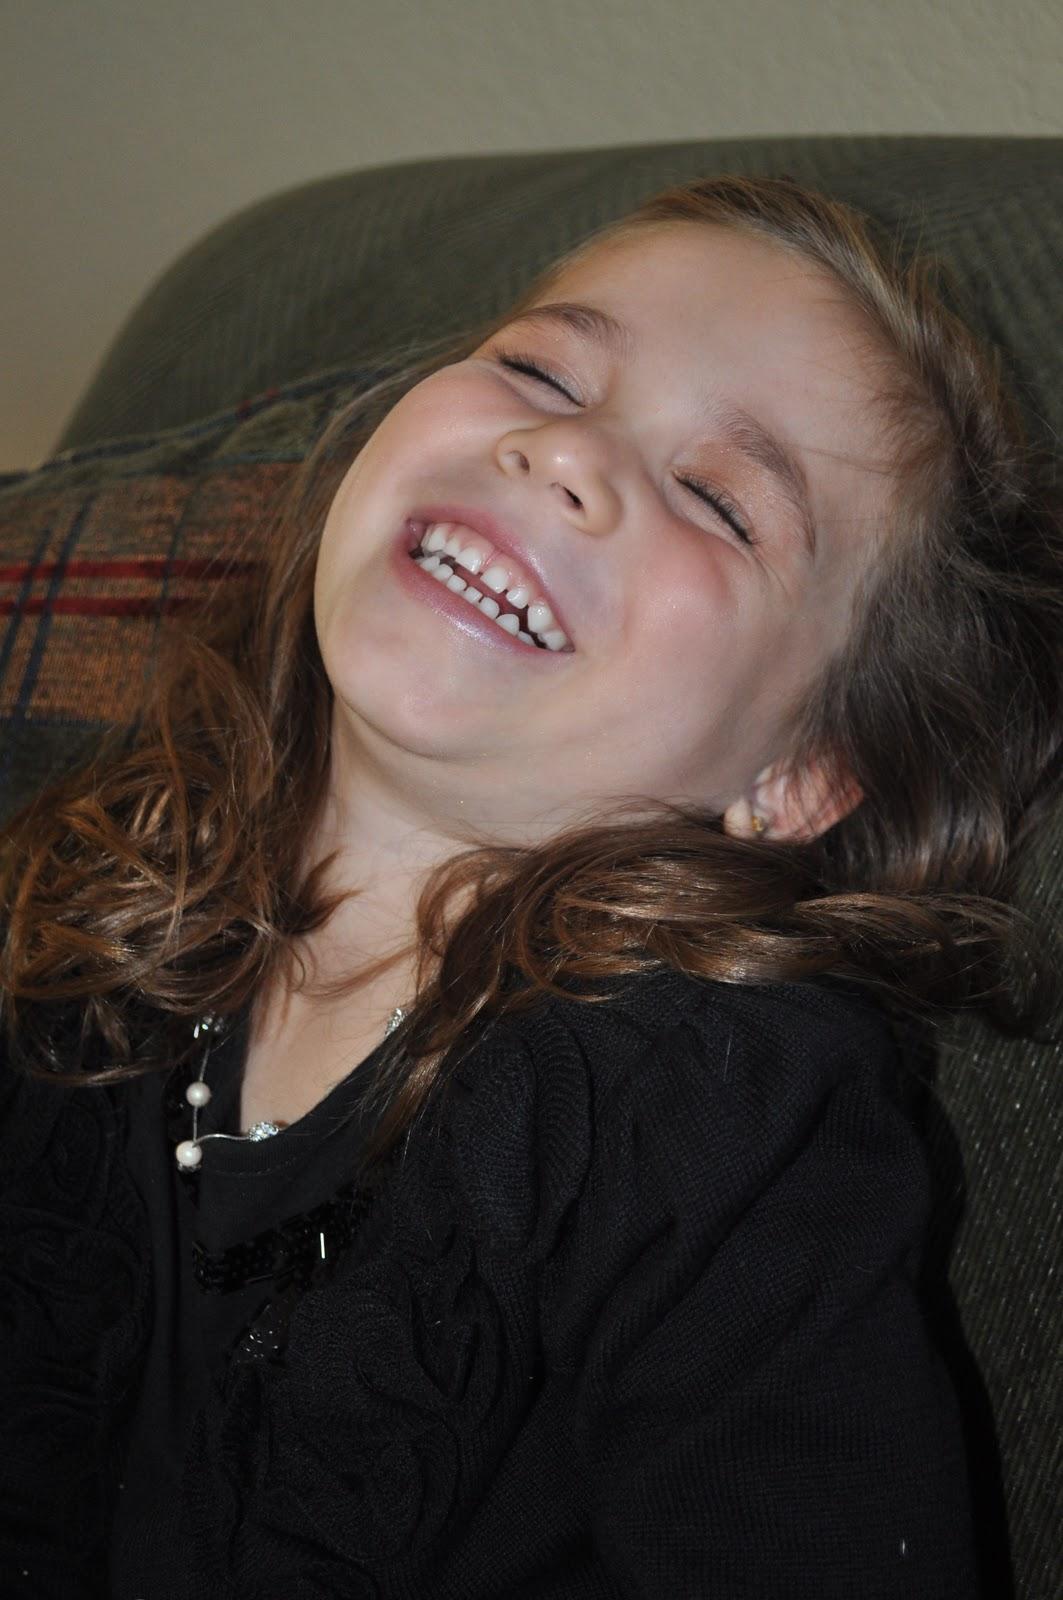 Mommy Daughter Date- Riverdance & BJs